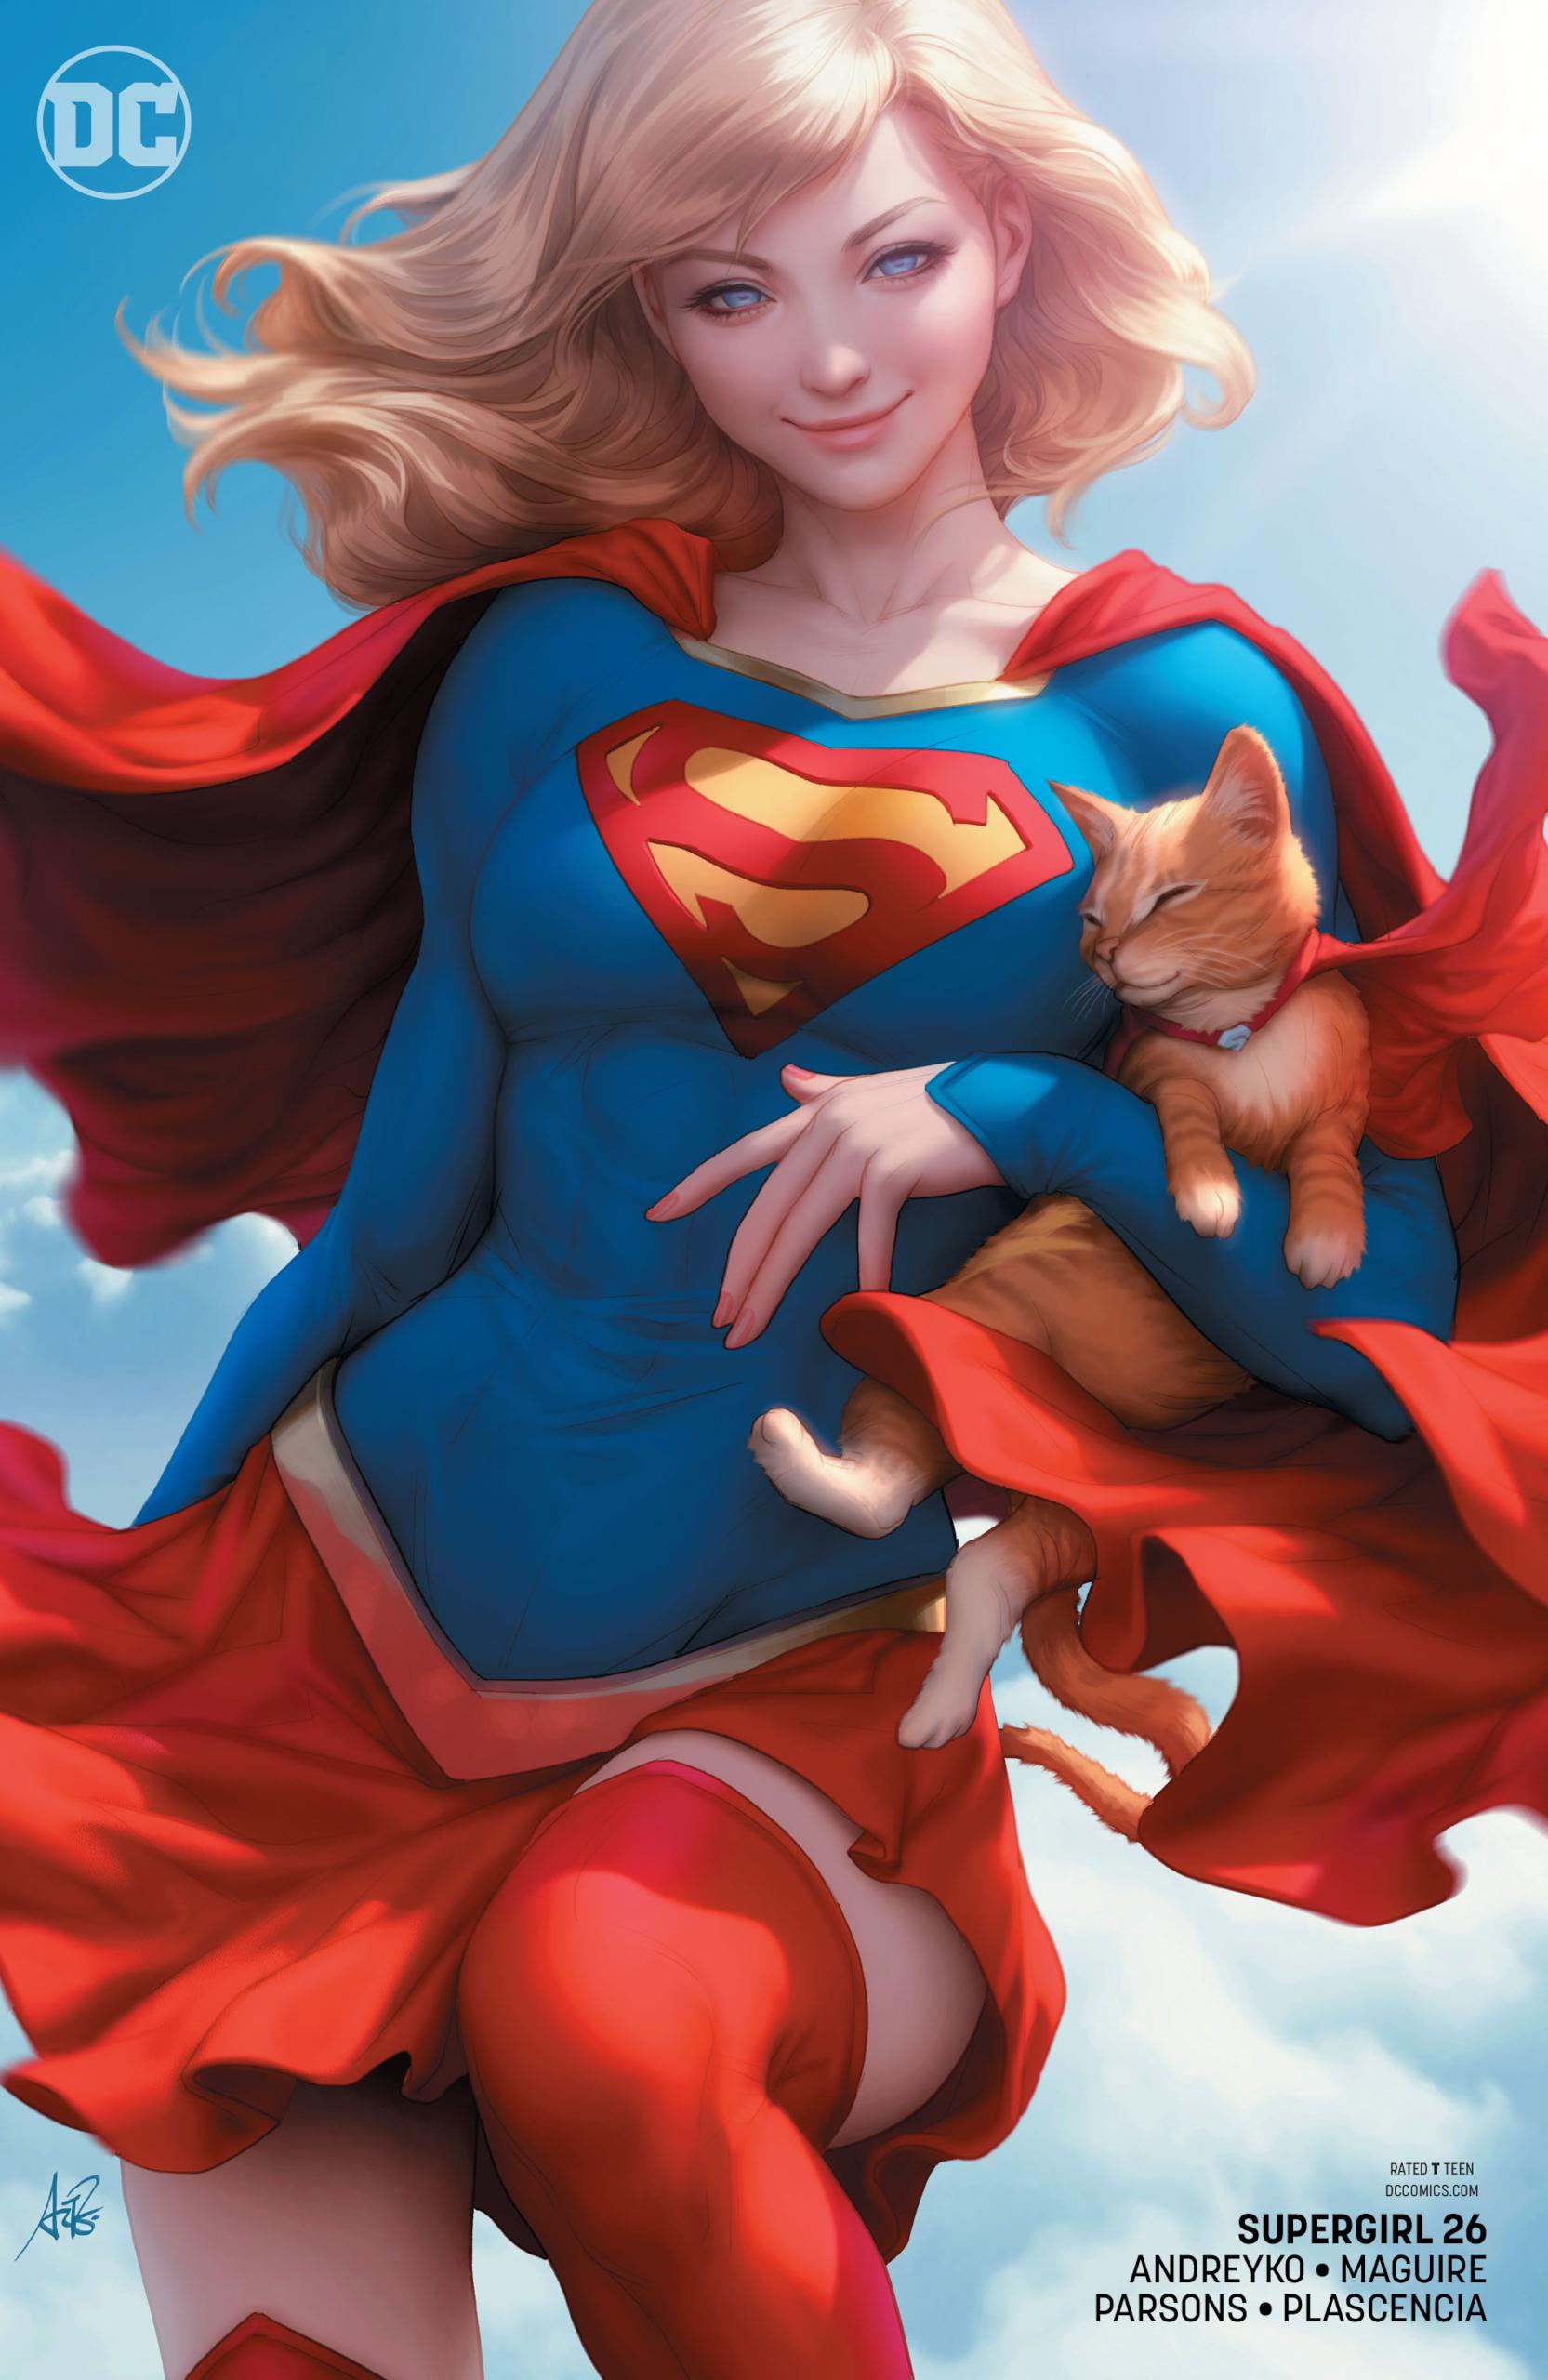 General 1665x2560 Supergirl DC Comics superheroines superhero blonde artwork cats poster portrait display Artgerm